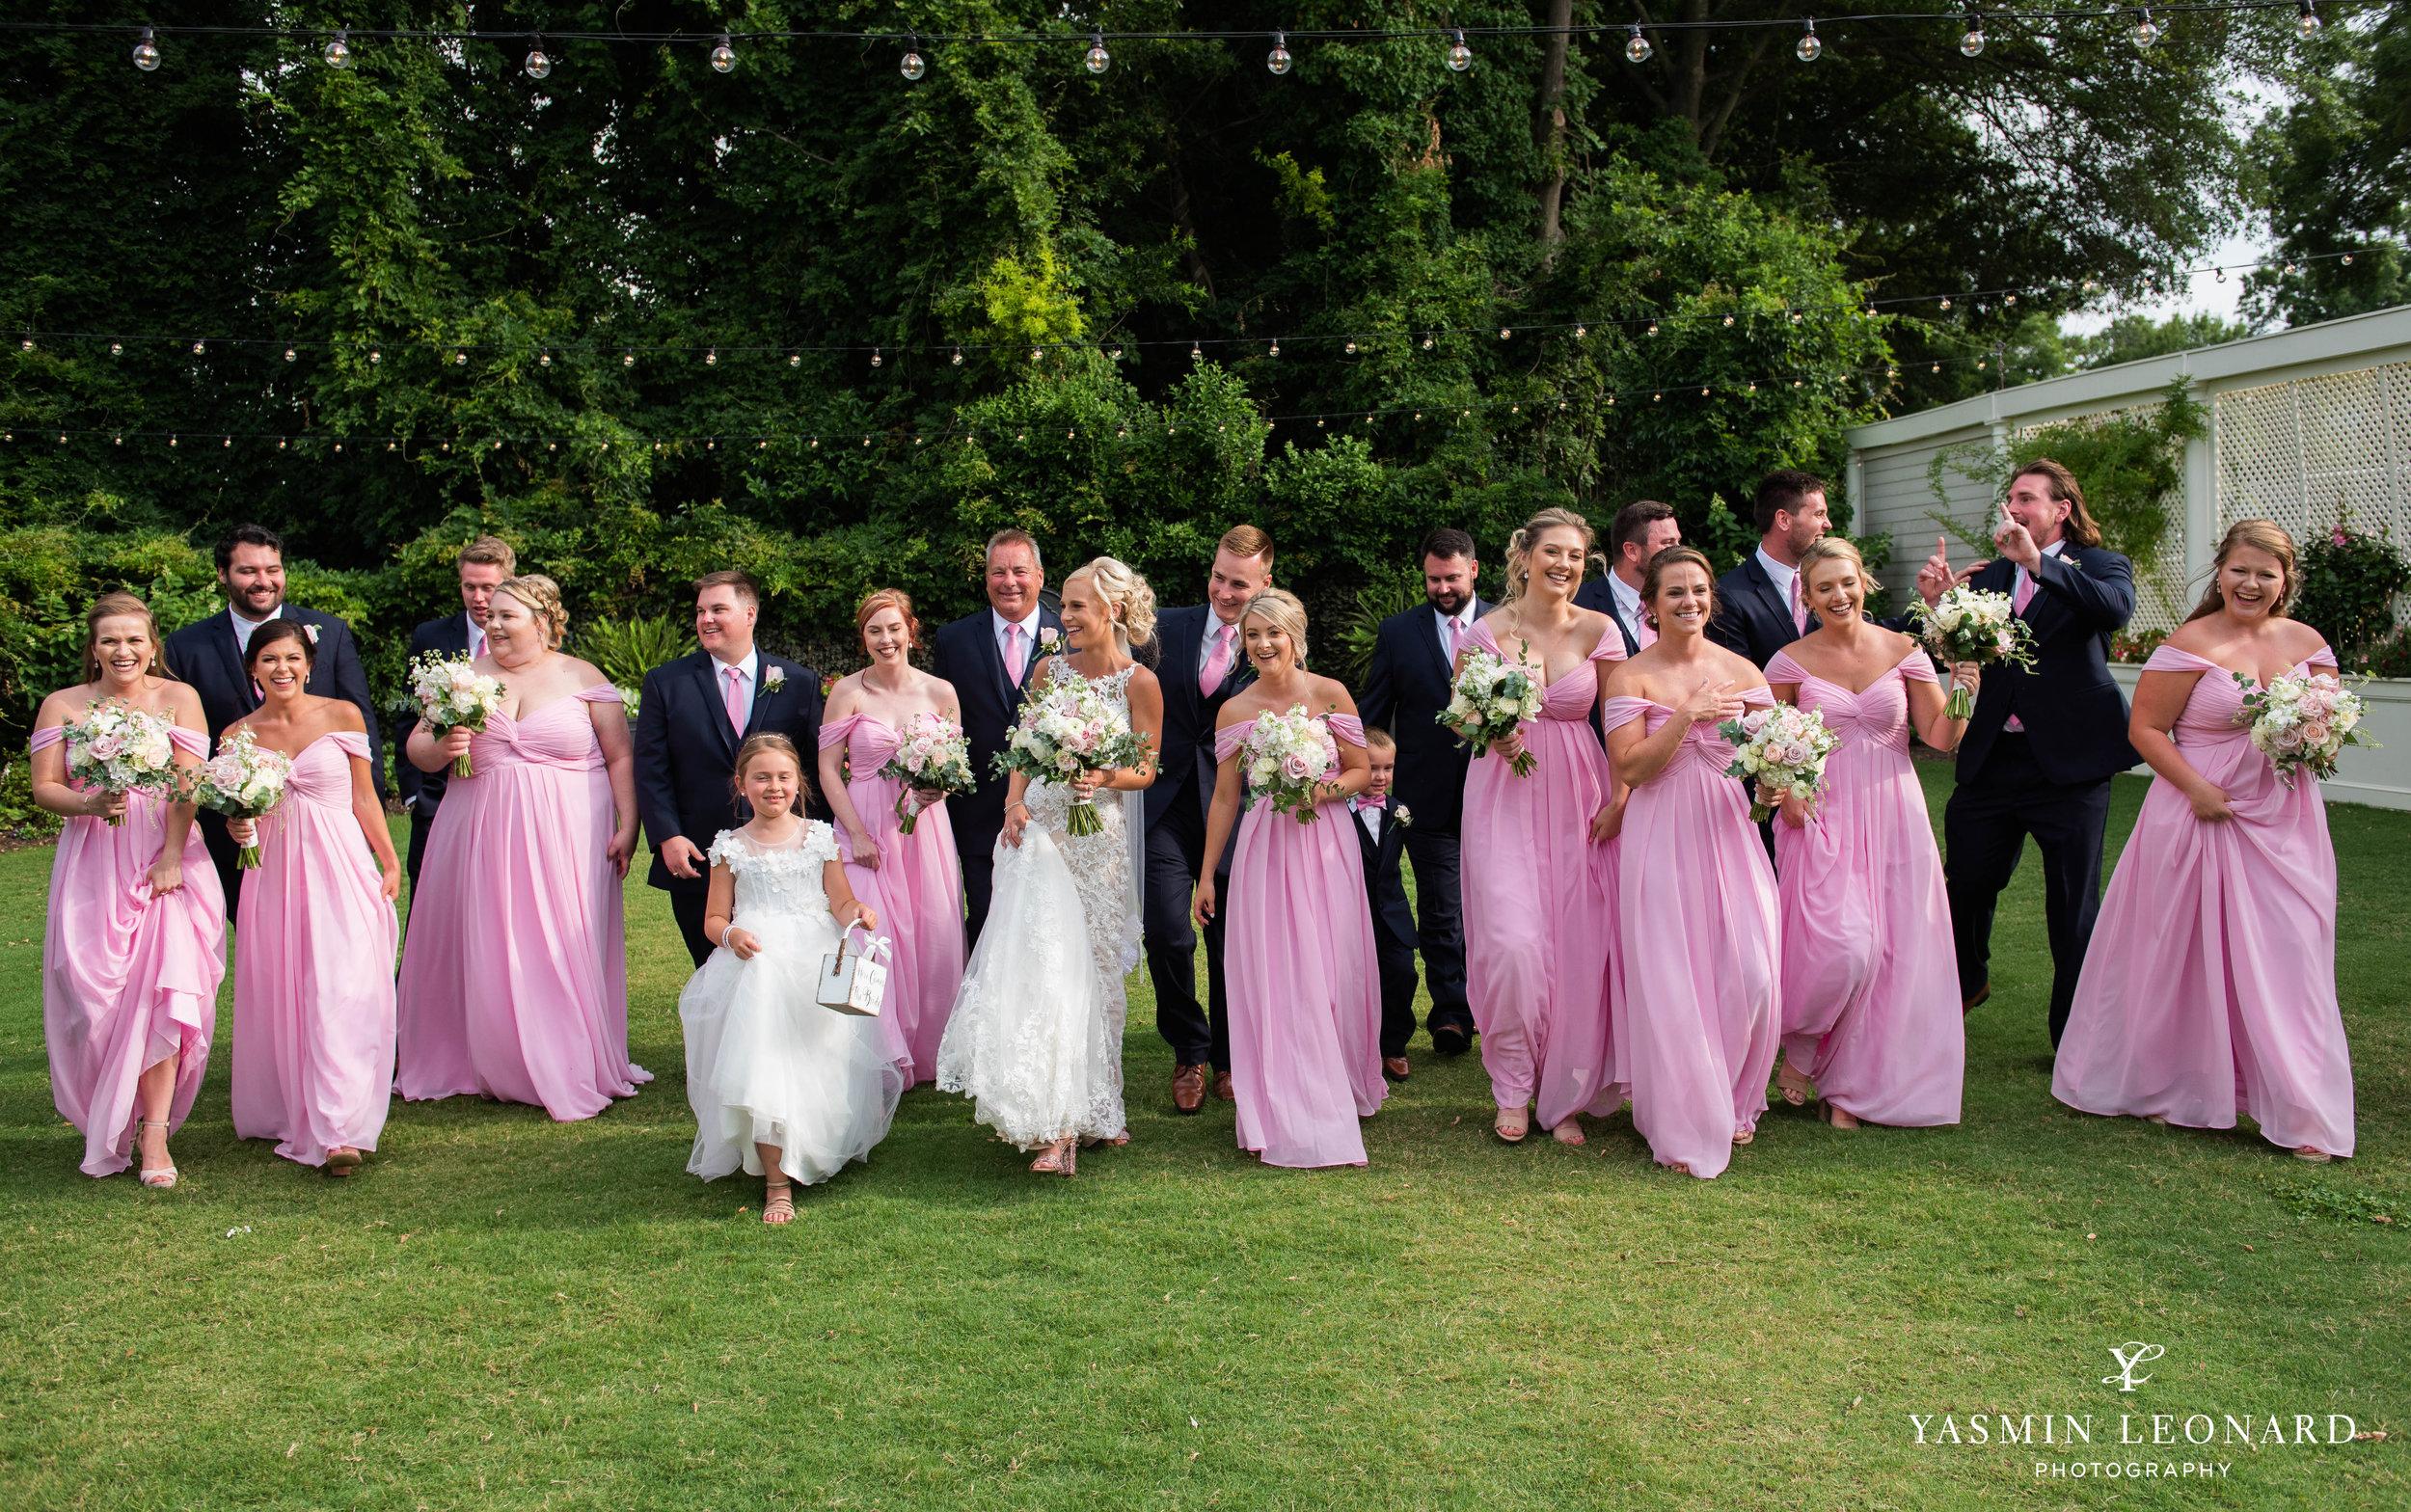 Separk Mansion - NC Weddings - Gastonia Wedding - NC Wedding Venues - Pink and Blue Wedding Ideas - Pink Bridesmaid Dresses - Yasmin Leonard Photography-26.jpg